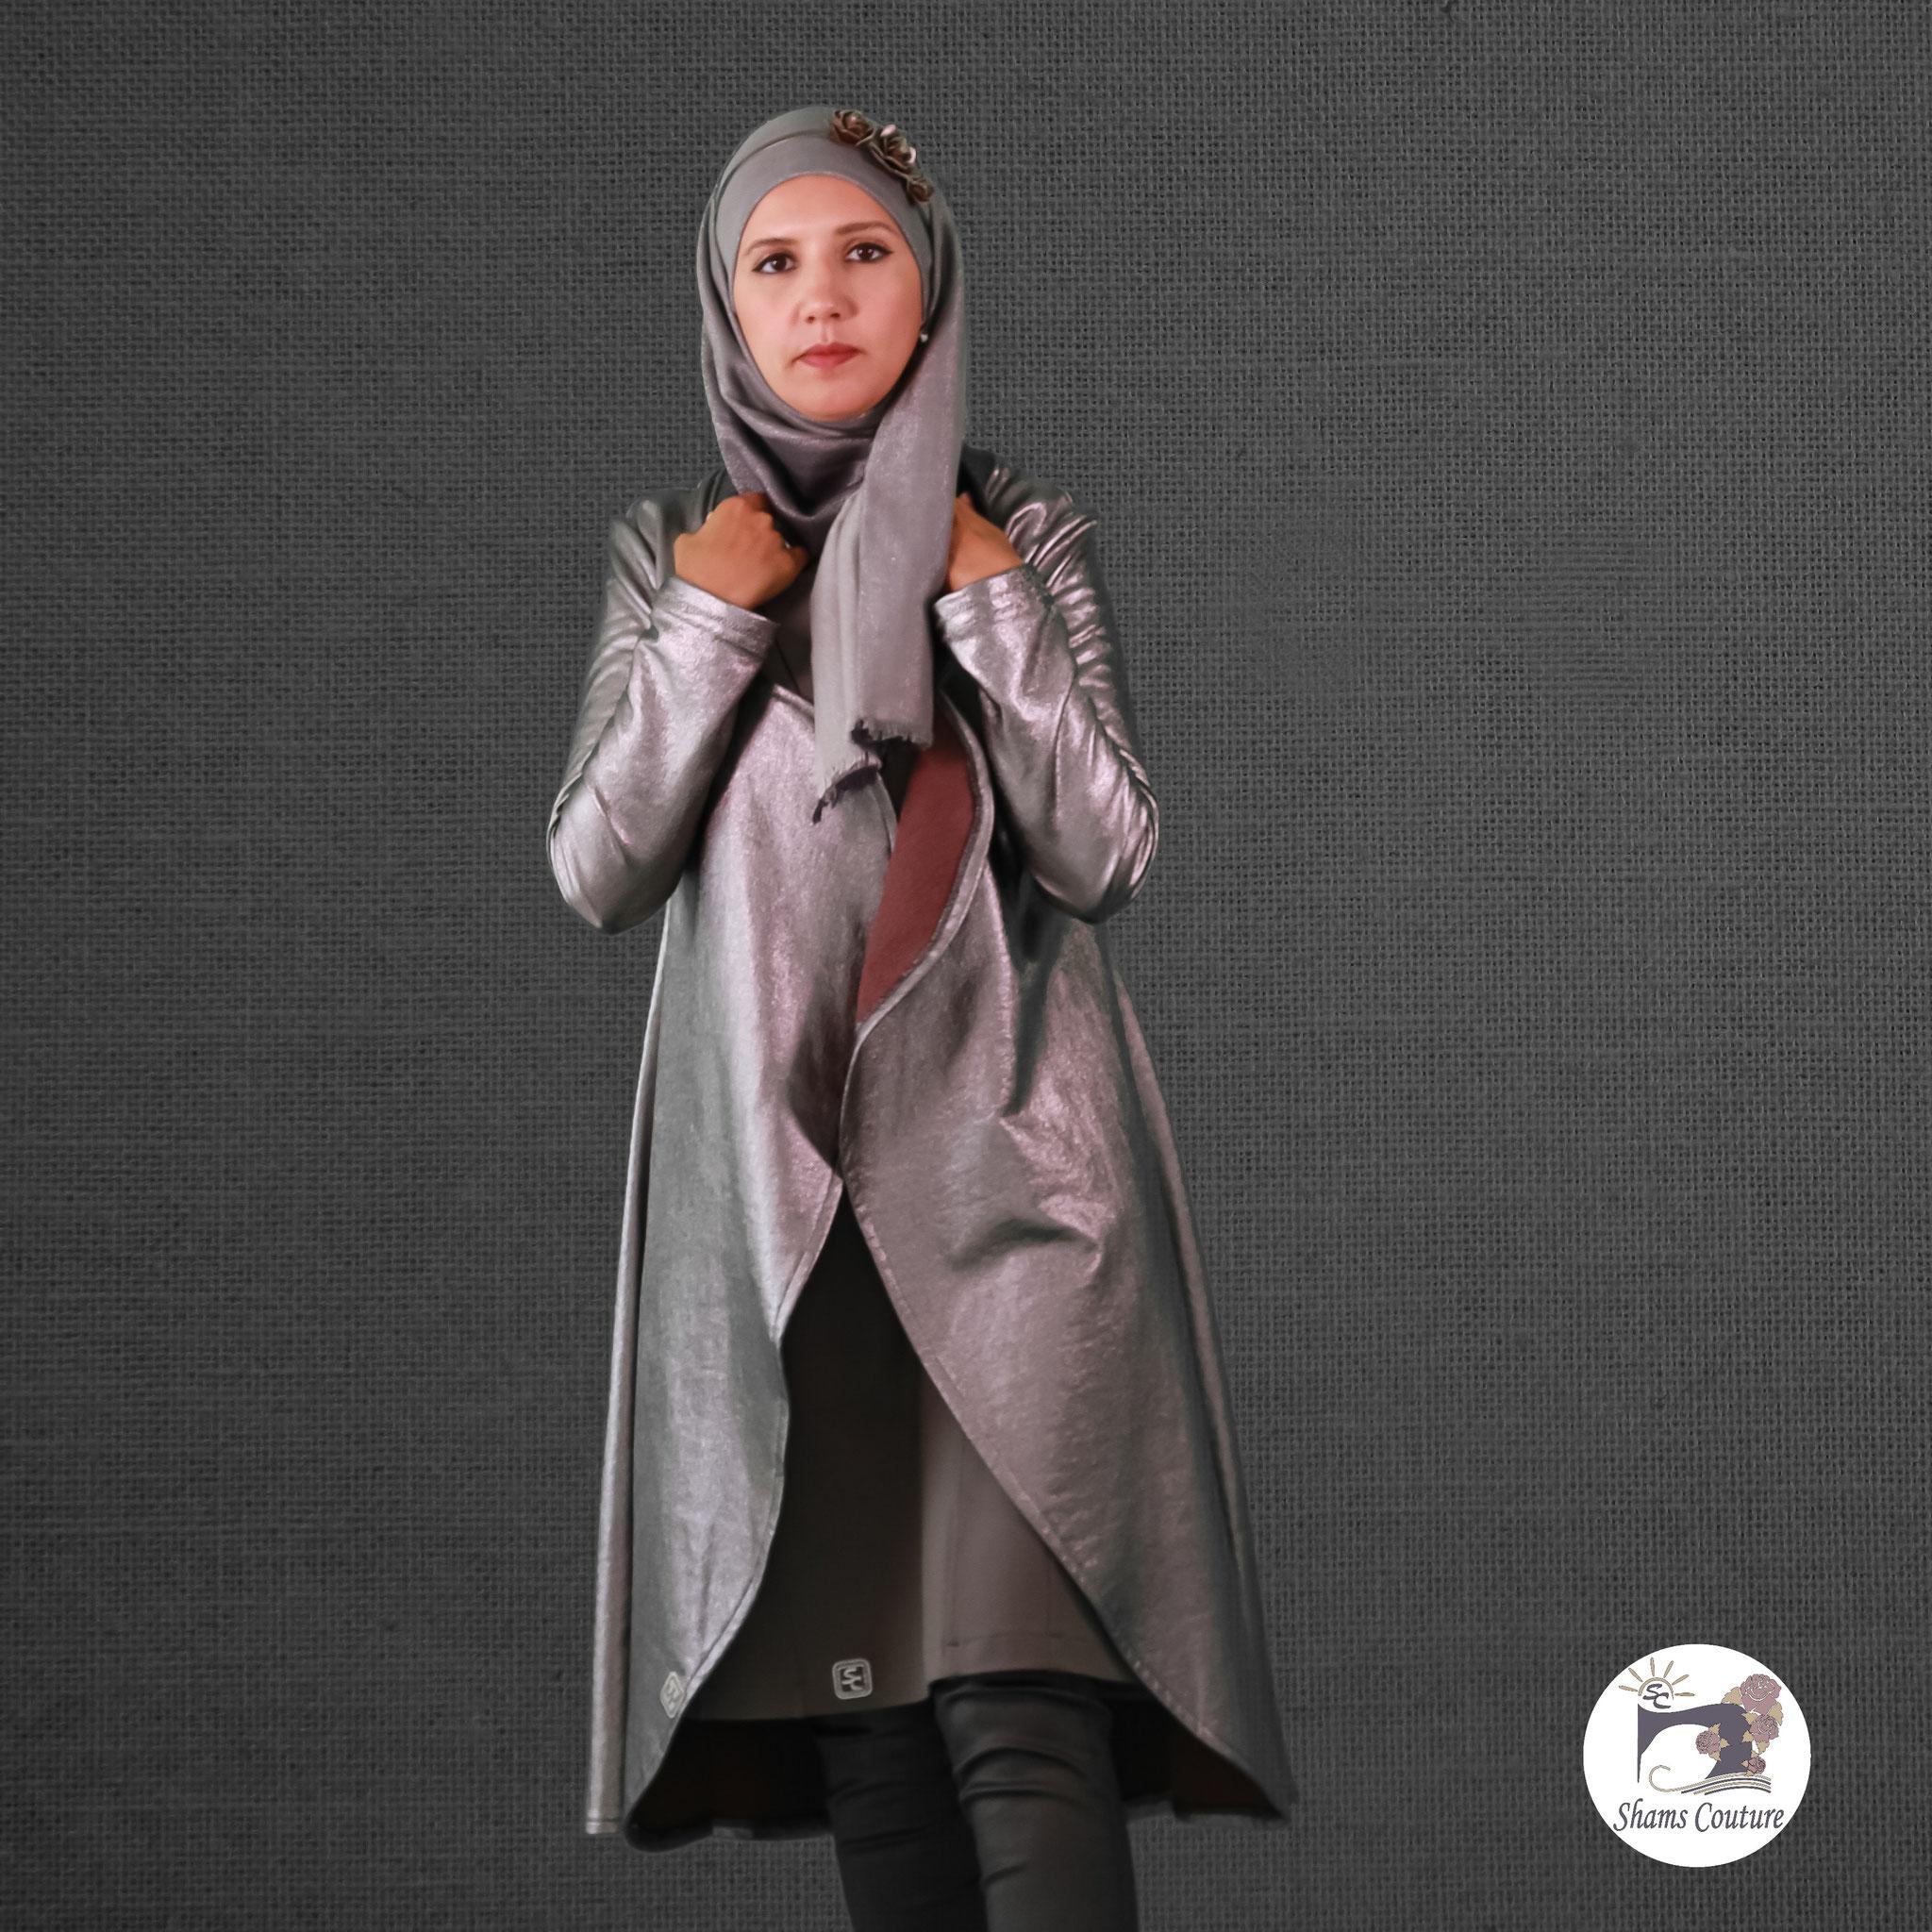 Modest Fashion Schnittmuster - Cardigan Modeste No.1